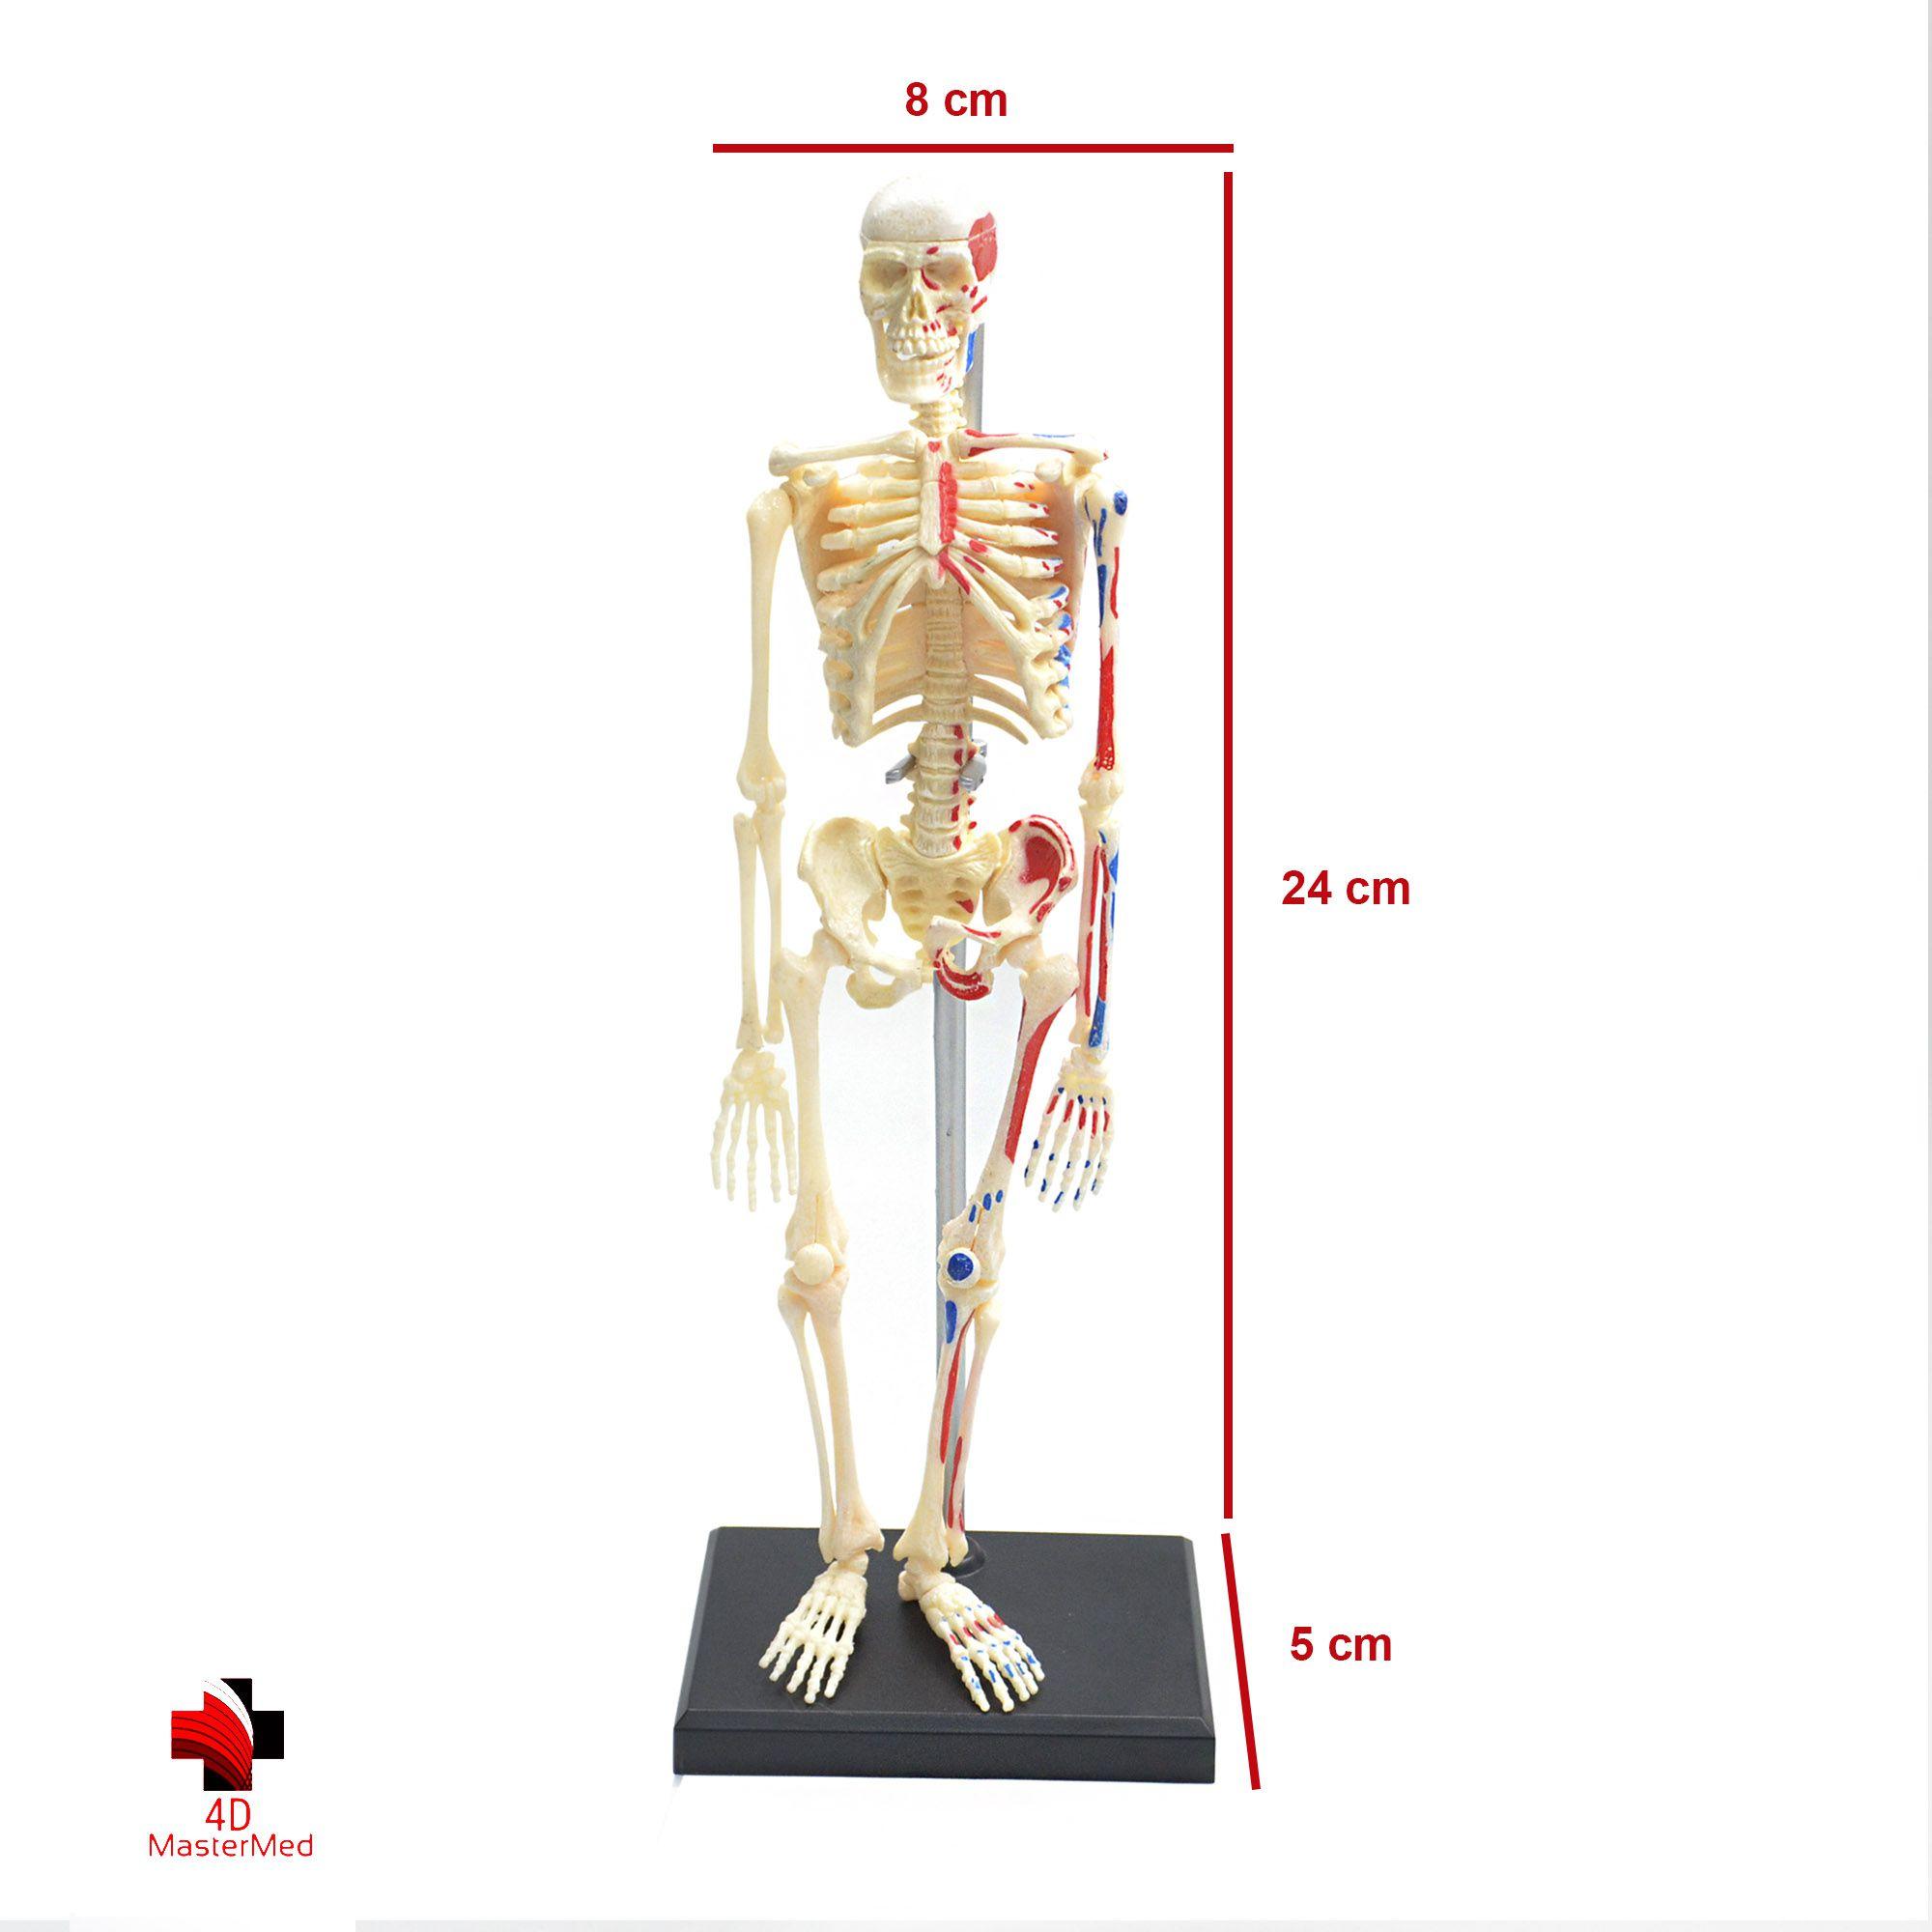 Kit anatomia humana - Esqueleto e Esqueleto e Músculos